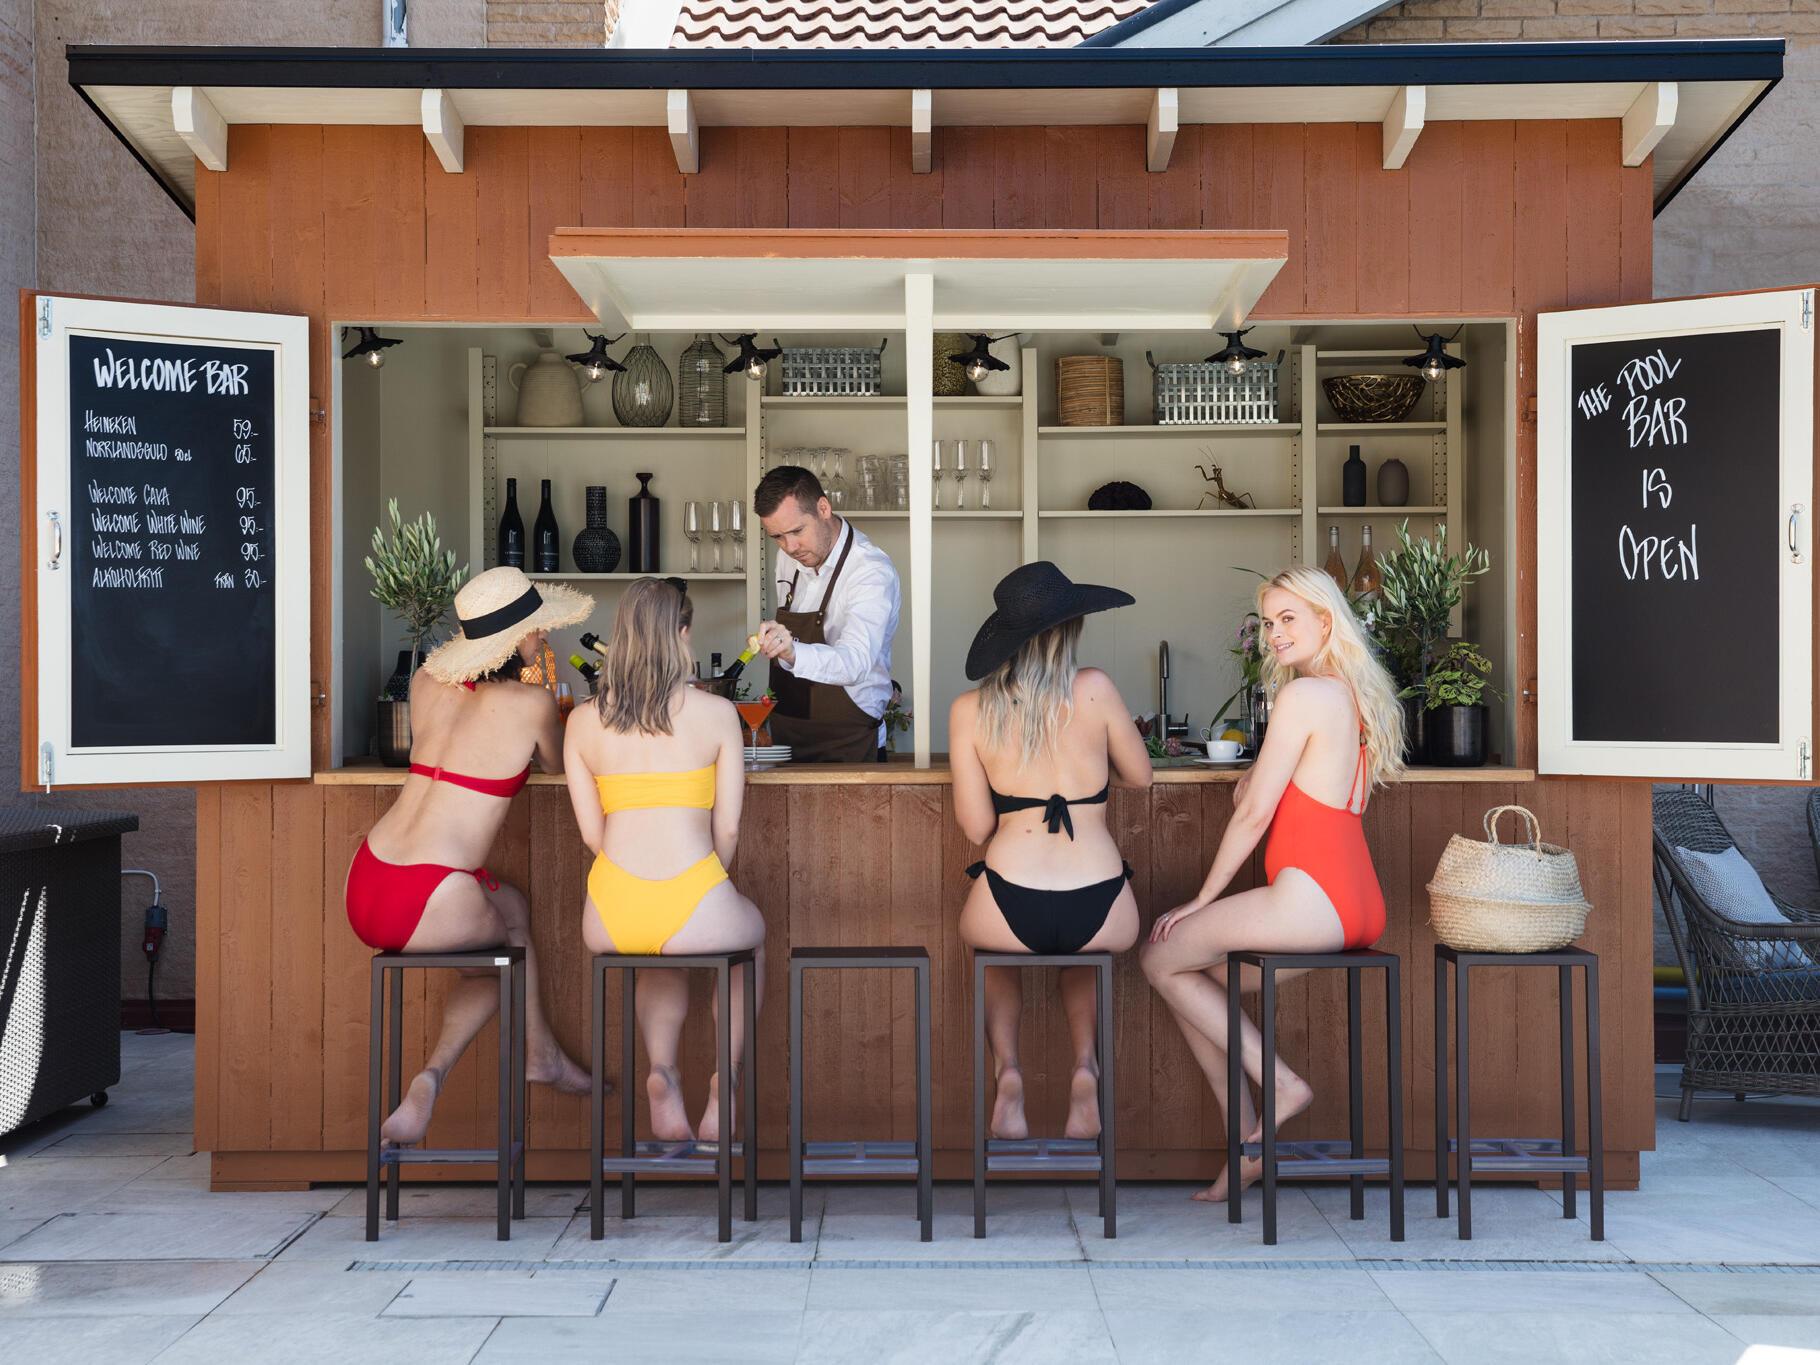 Summer Get Away at Welcome Hotel in Järfälla near Stockholm